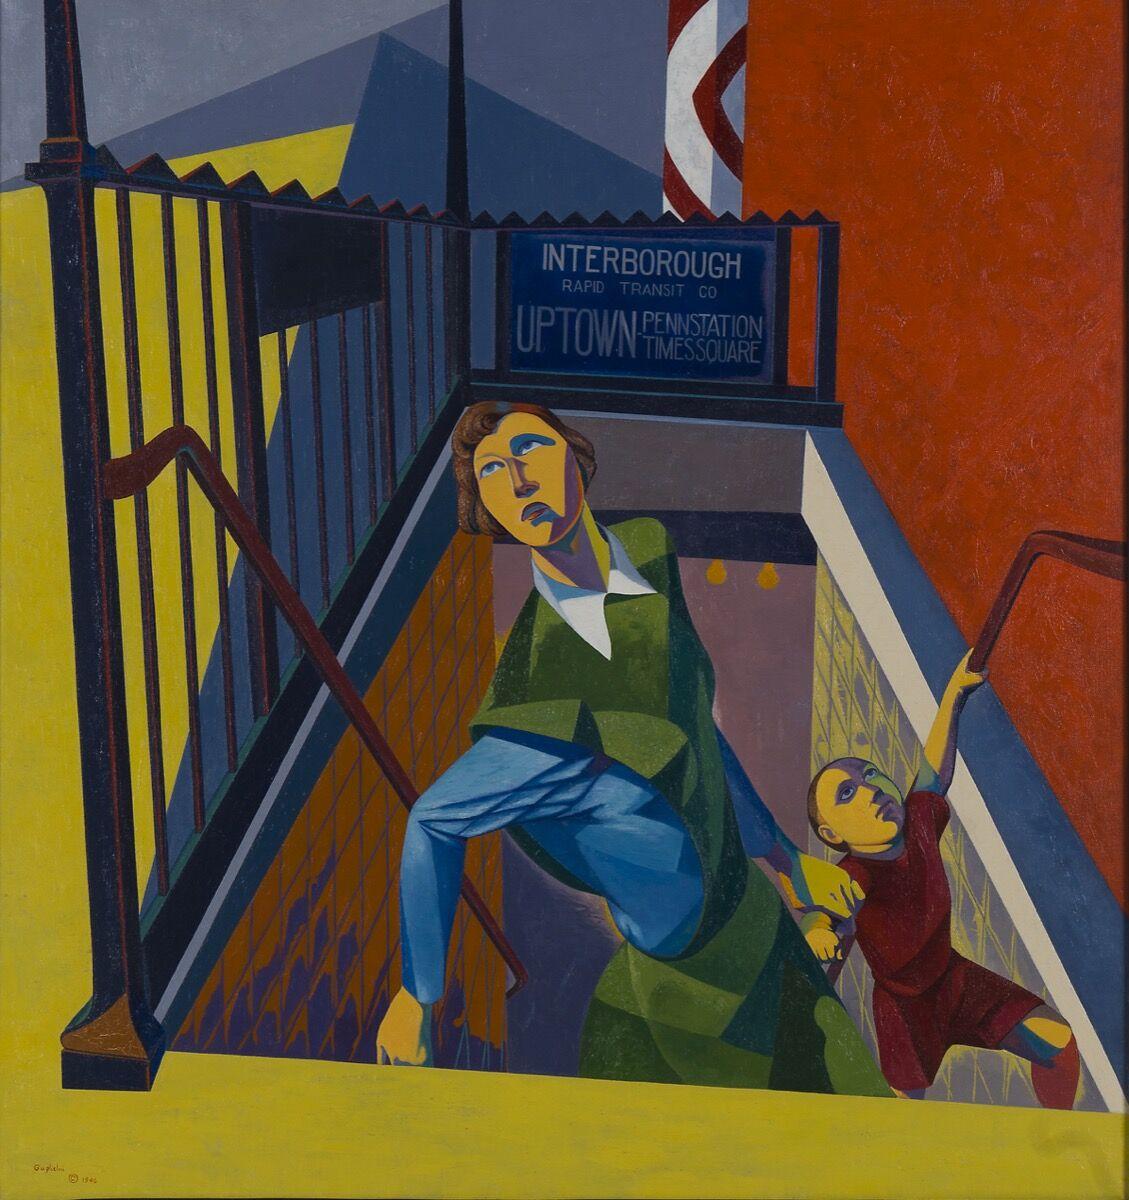 O. Louis Guglielmi, Subway Exit, 1946. Courtesy of the Jewish Museum.